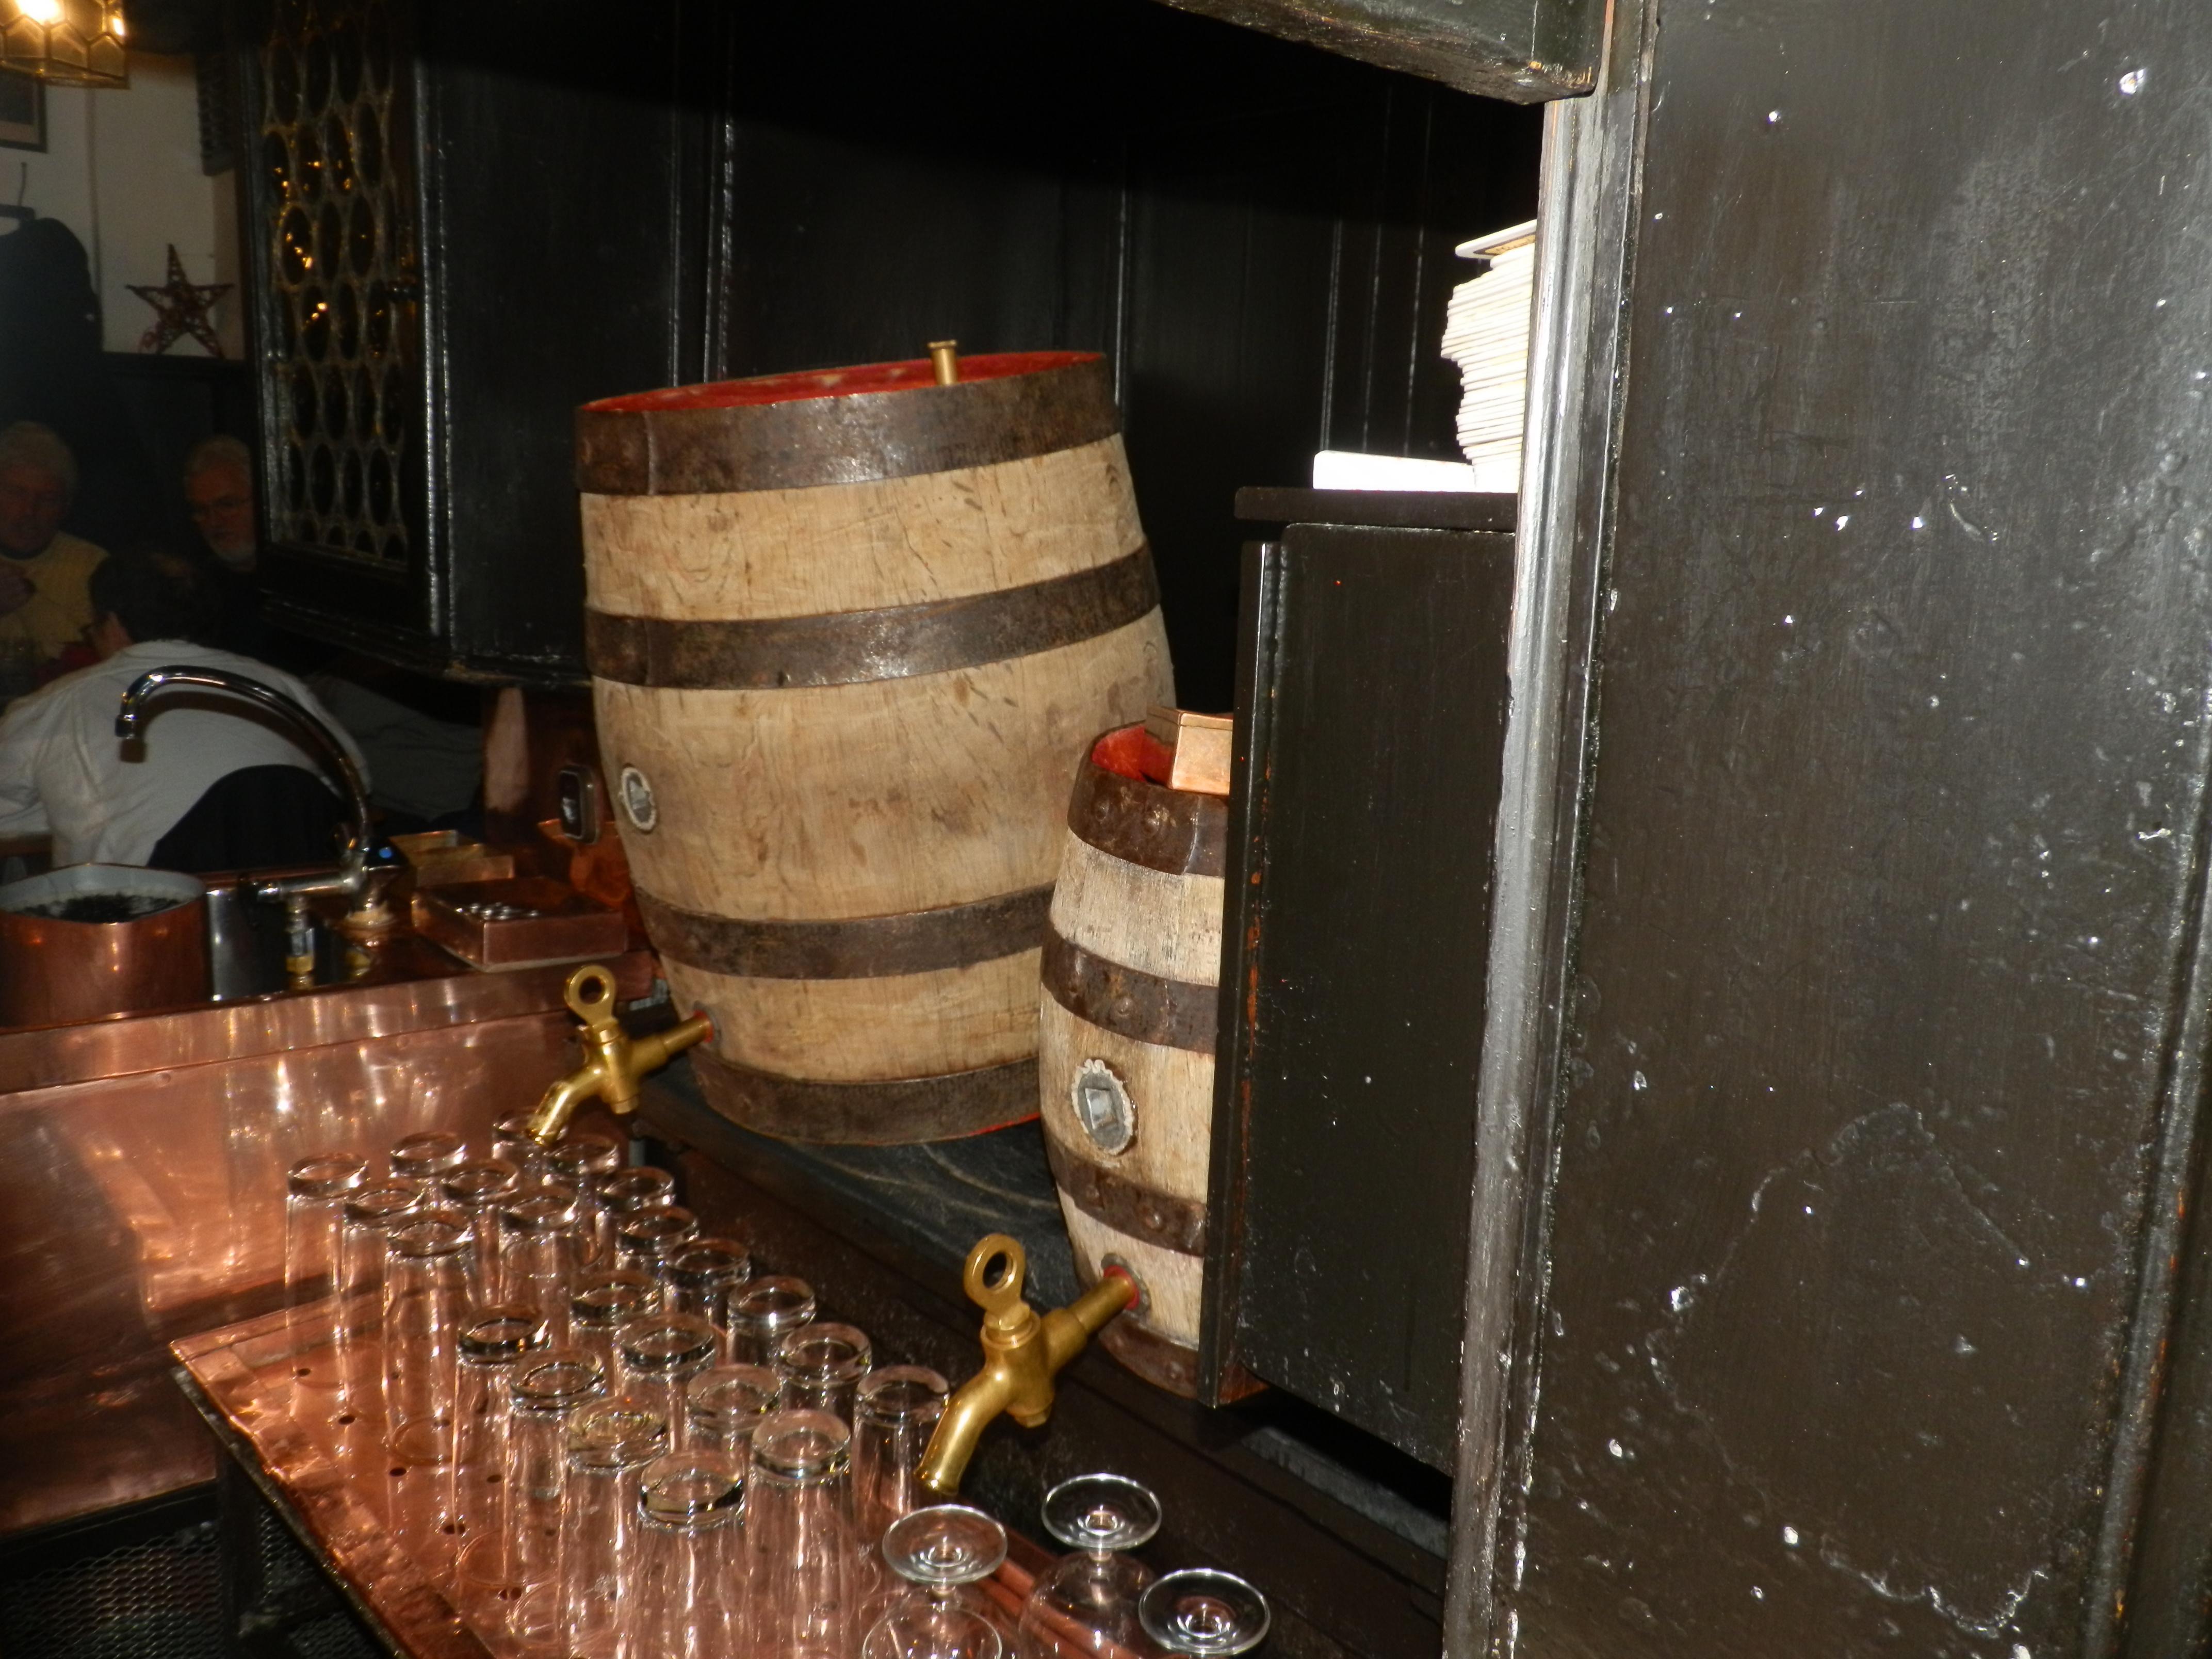 Von Bambergs ältester zu Bambergs zweit-jüngster Brauerei